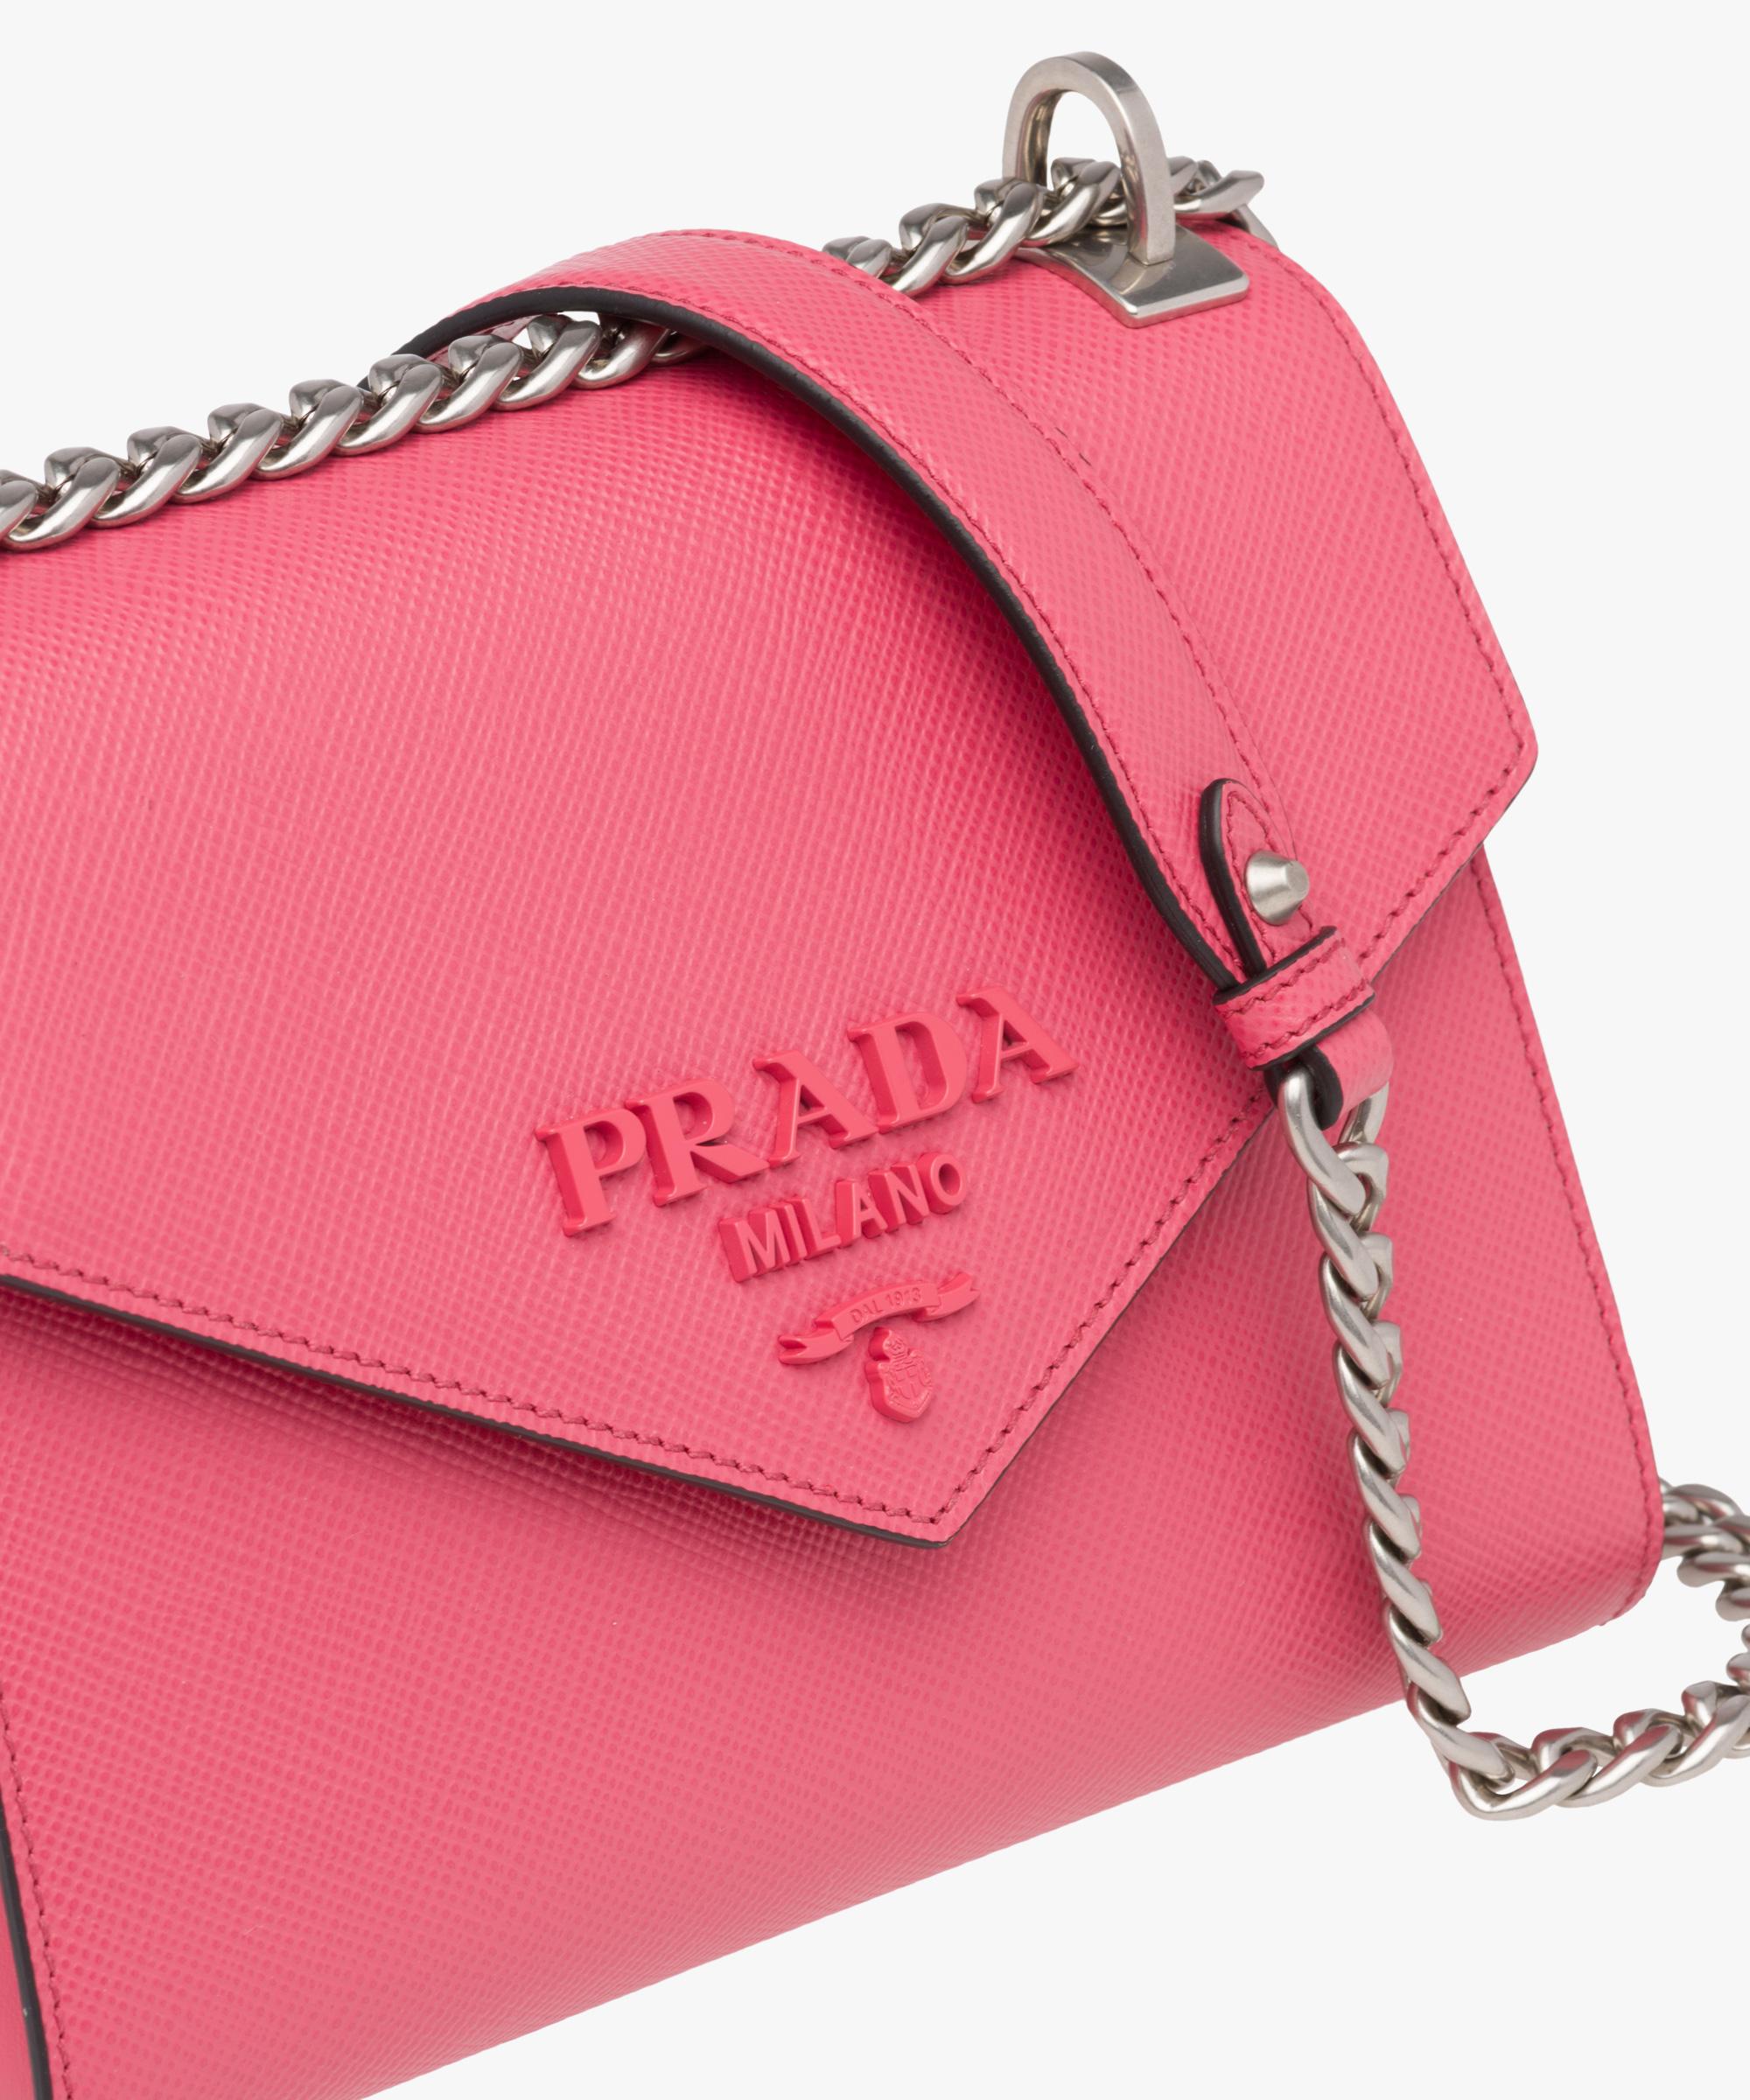 6a77bc2b3002 Prada Prada Monochrome Saffiano leather bag at £1400 | love the brands